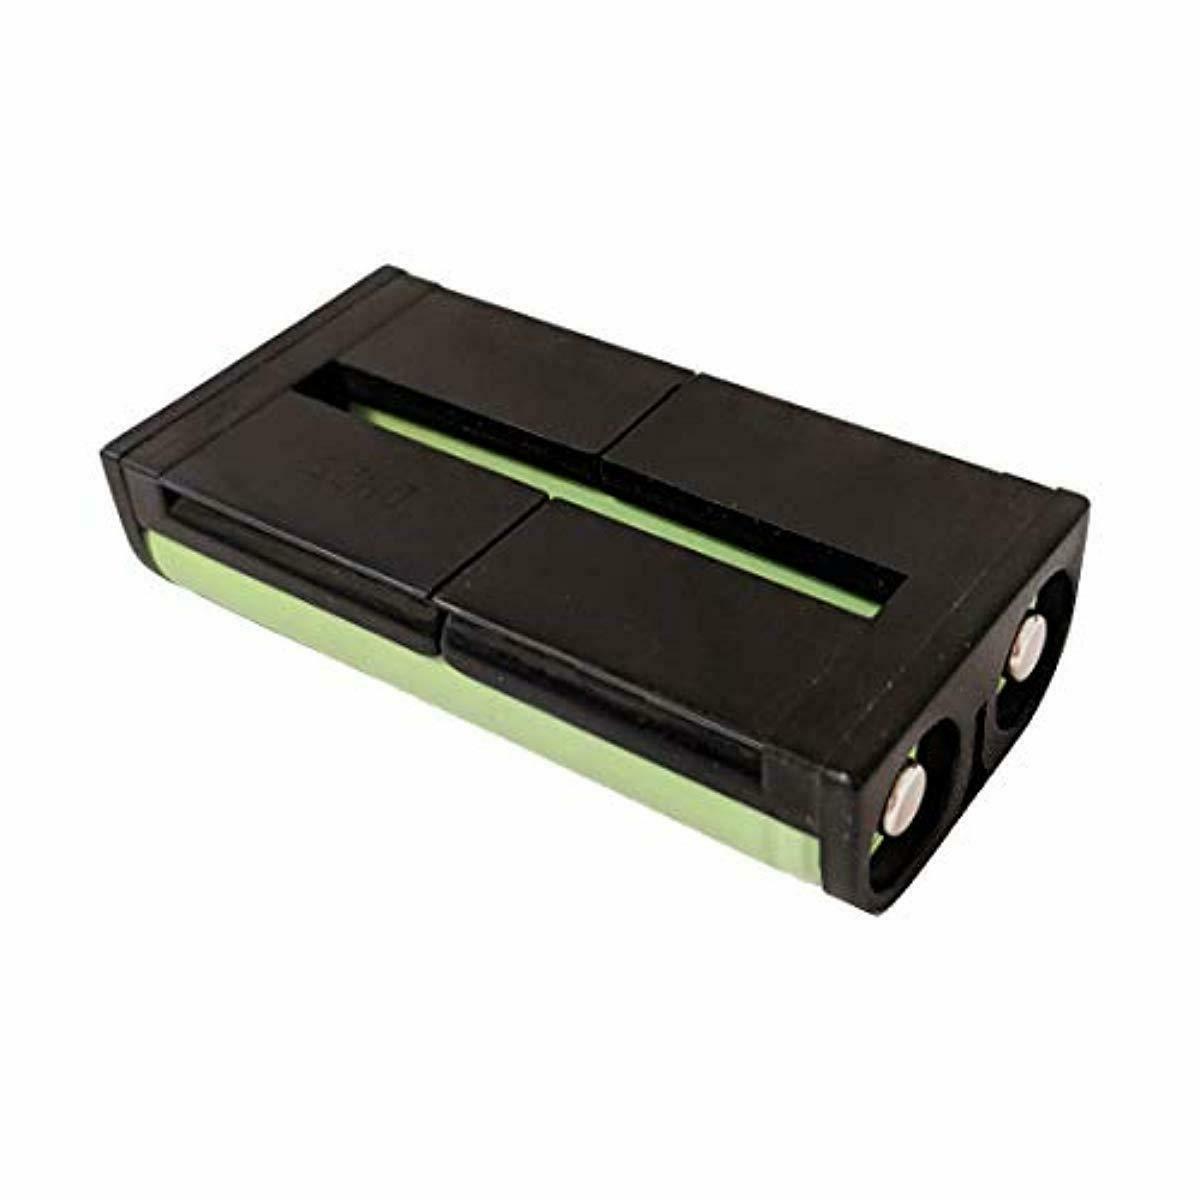 2 Pack BP-HP550-11 Battery for BP-HP550-11 Headphone